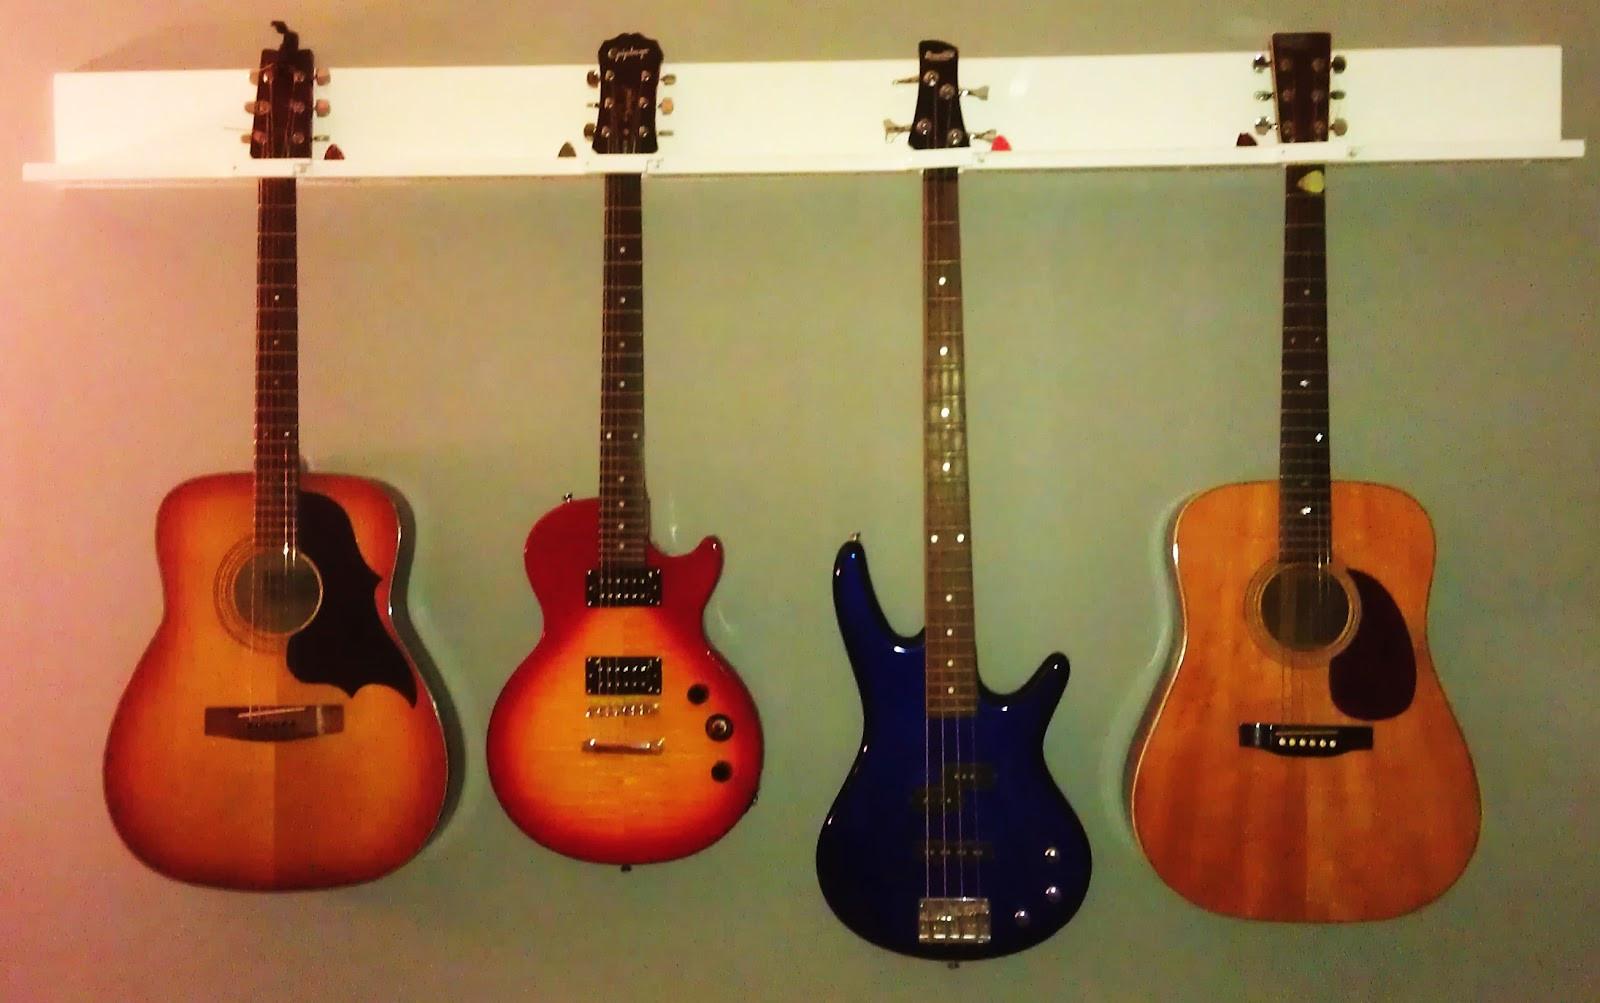 Best ideas about Guitar Wall Hanger DIY . Save or Pin DIY 4 Guitar Wall Hanger Cost $15ish FEATURED AS AN Now.